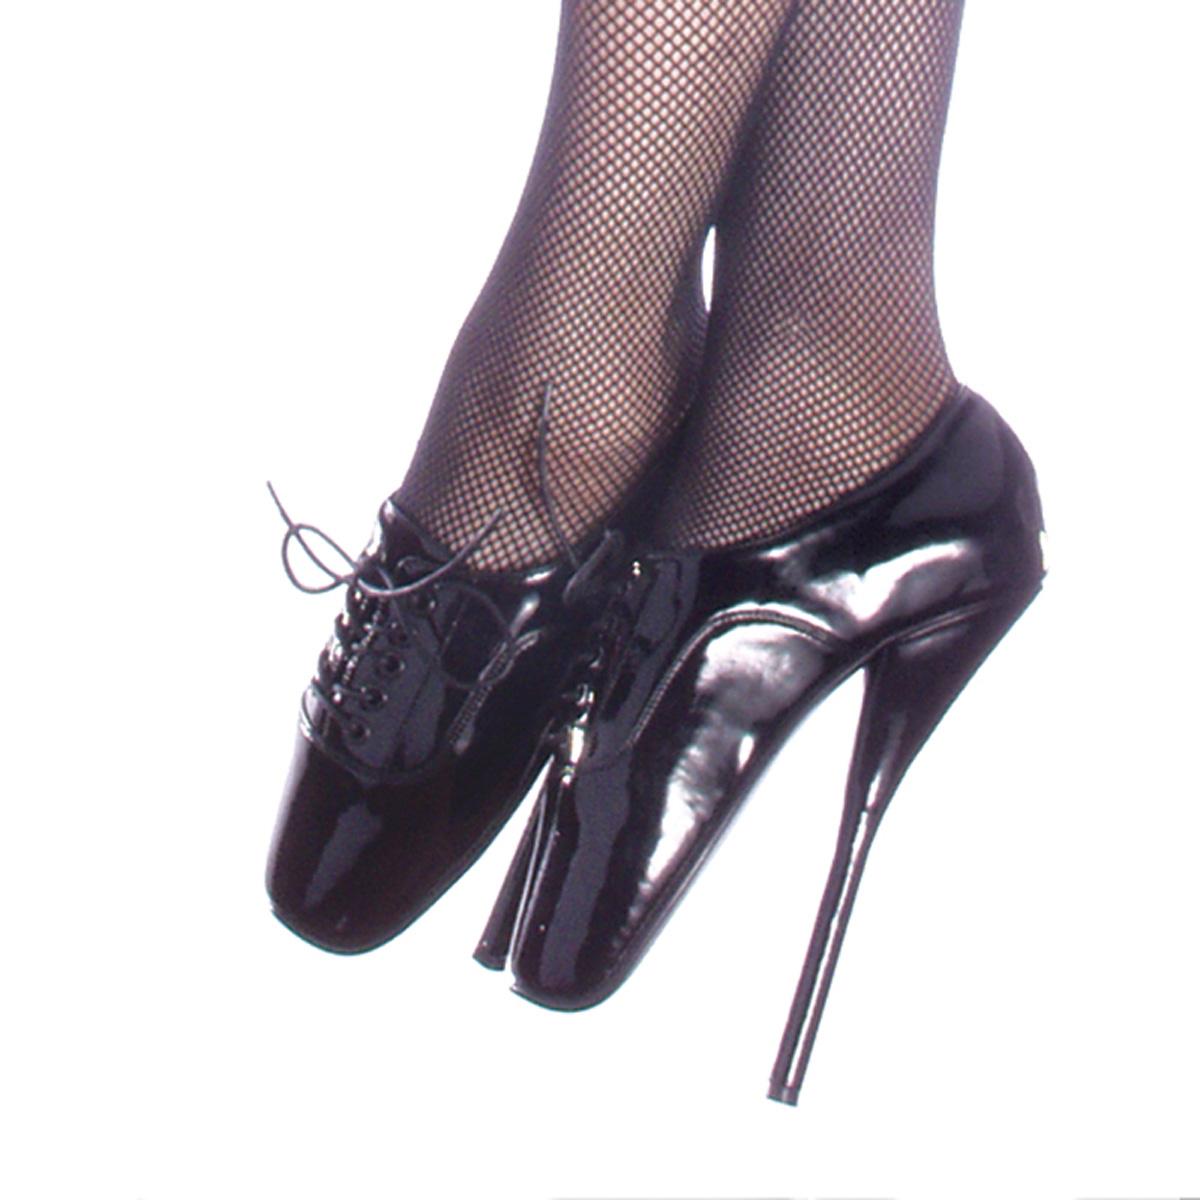 Bondage in heels